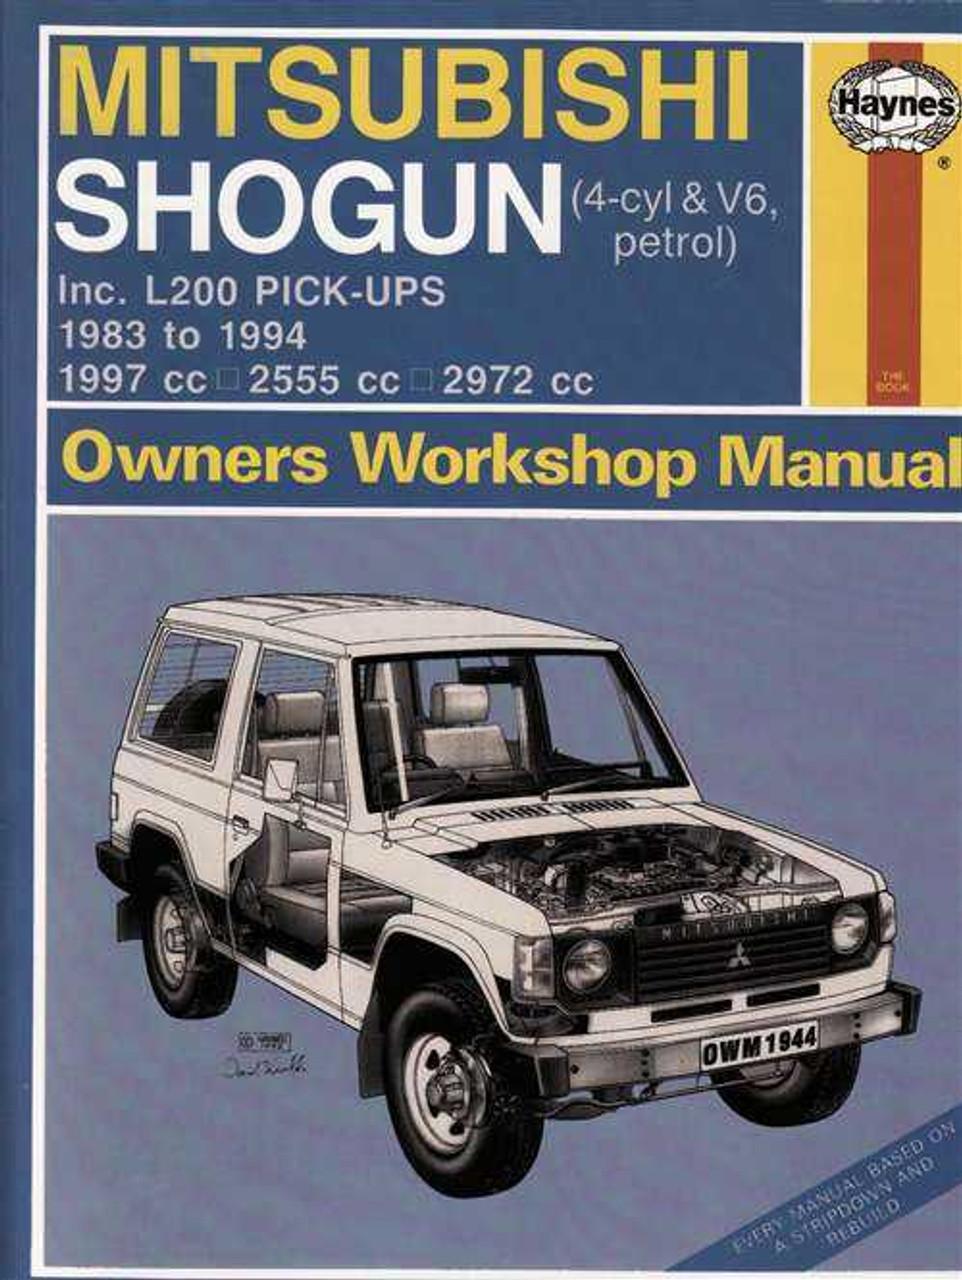 mitsubishi shogun incl l200 pick ups 1983 1997 workshop manual rh automotobookshop com au mitsubishi pajero pinin workshop manual mitsubishi pajero workshop manual pdf